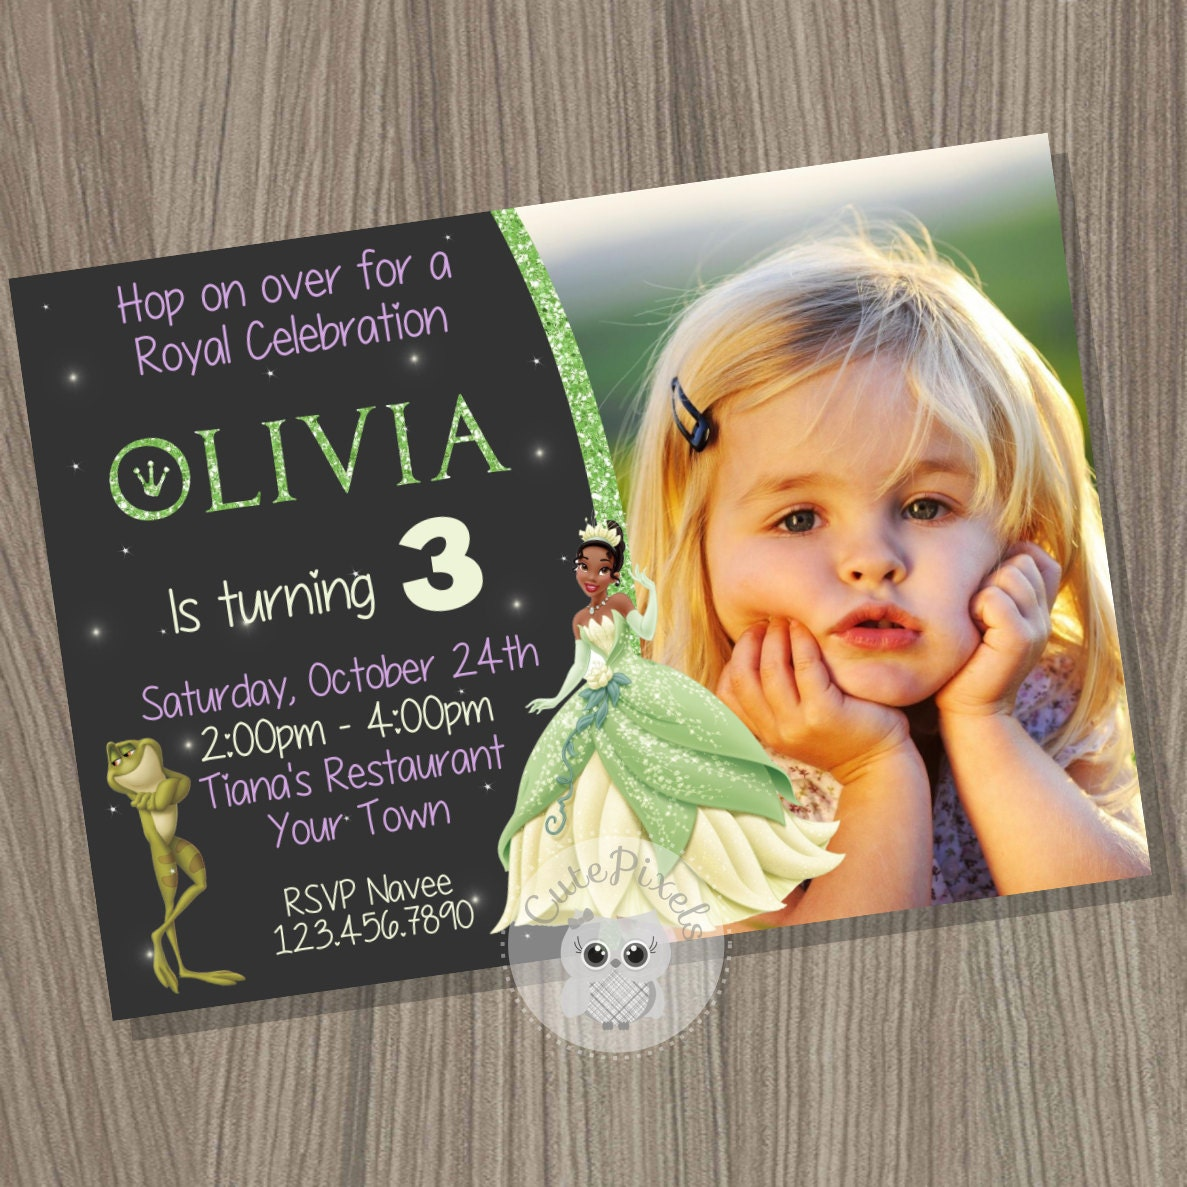 Princess tiana party – Princess Tiana Birthday Invitations